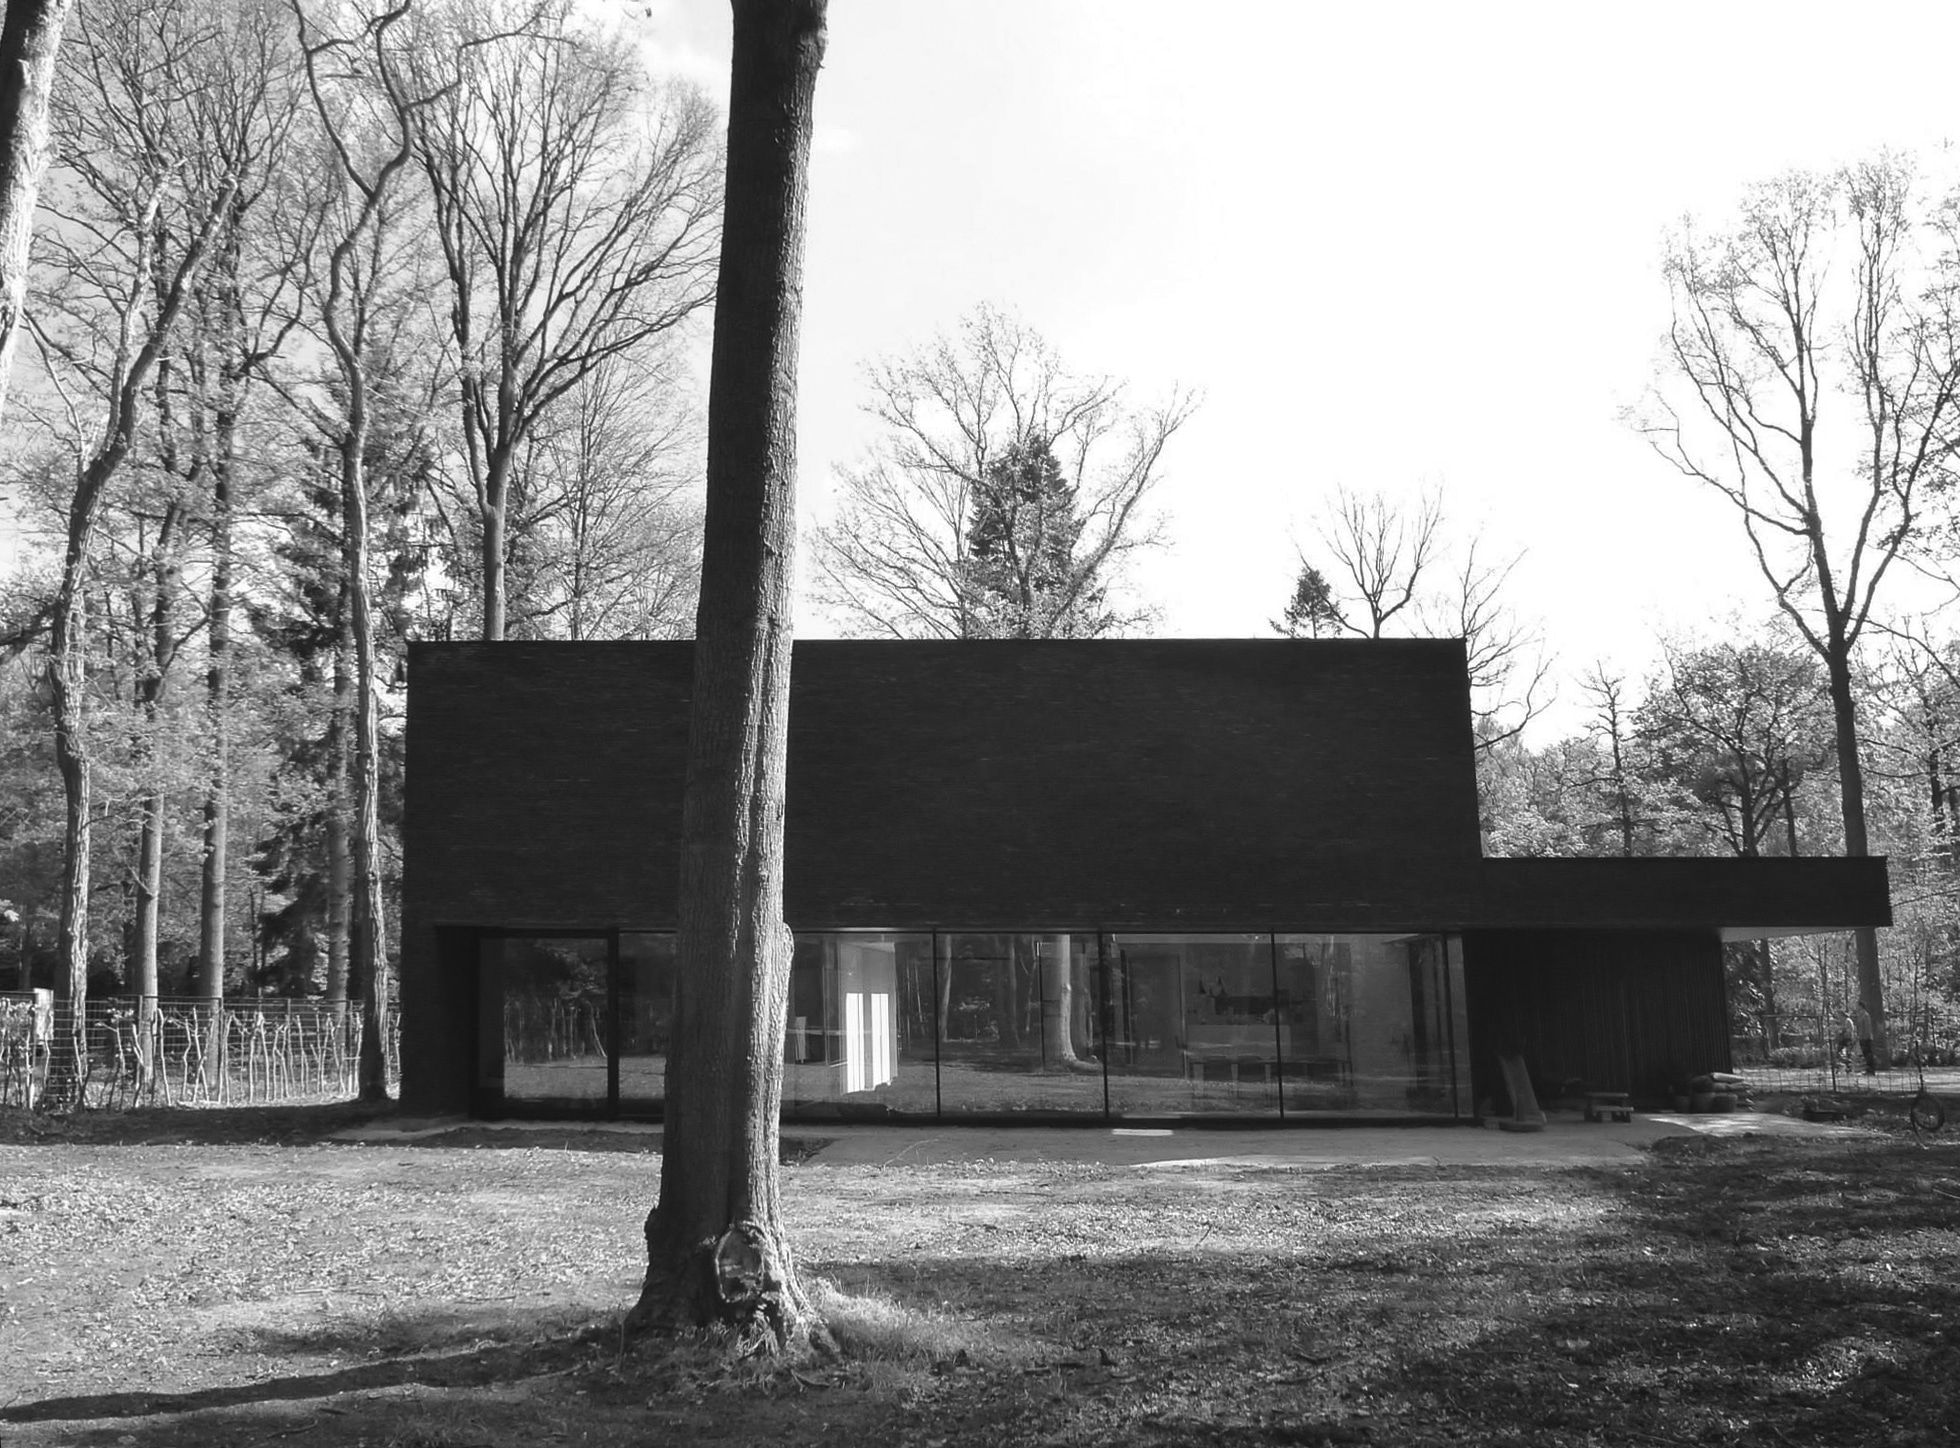 10329910 628031147274763 5418590514007092179 o | Baeyens & Beck architecten Gent | architect nieuwbouw renovatie interieur | high end | architectenbureau